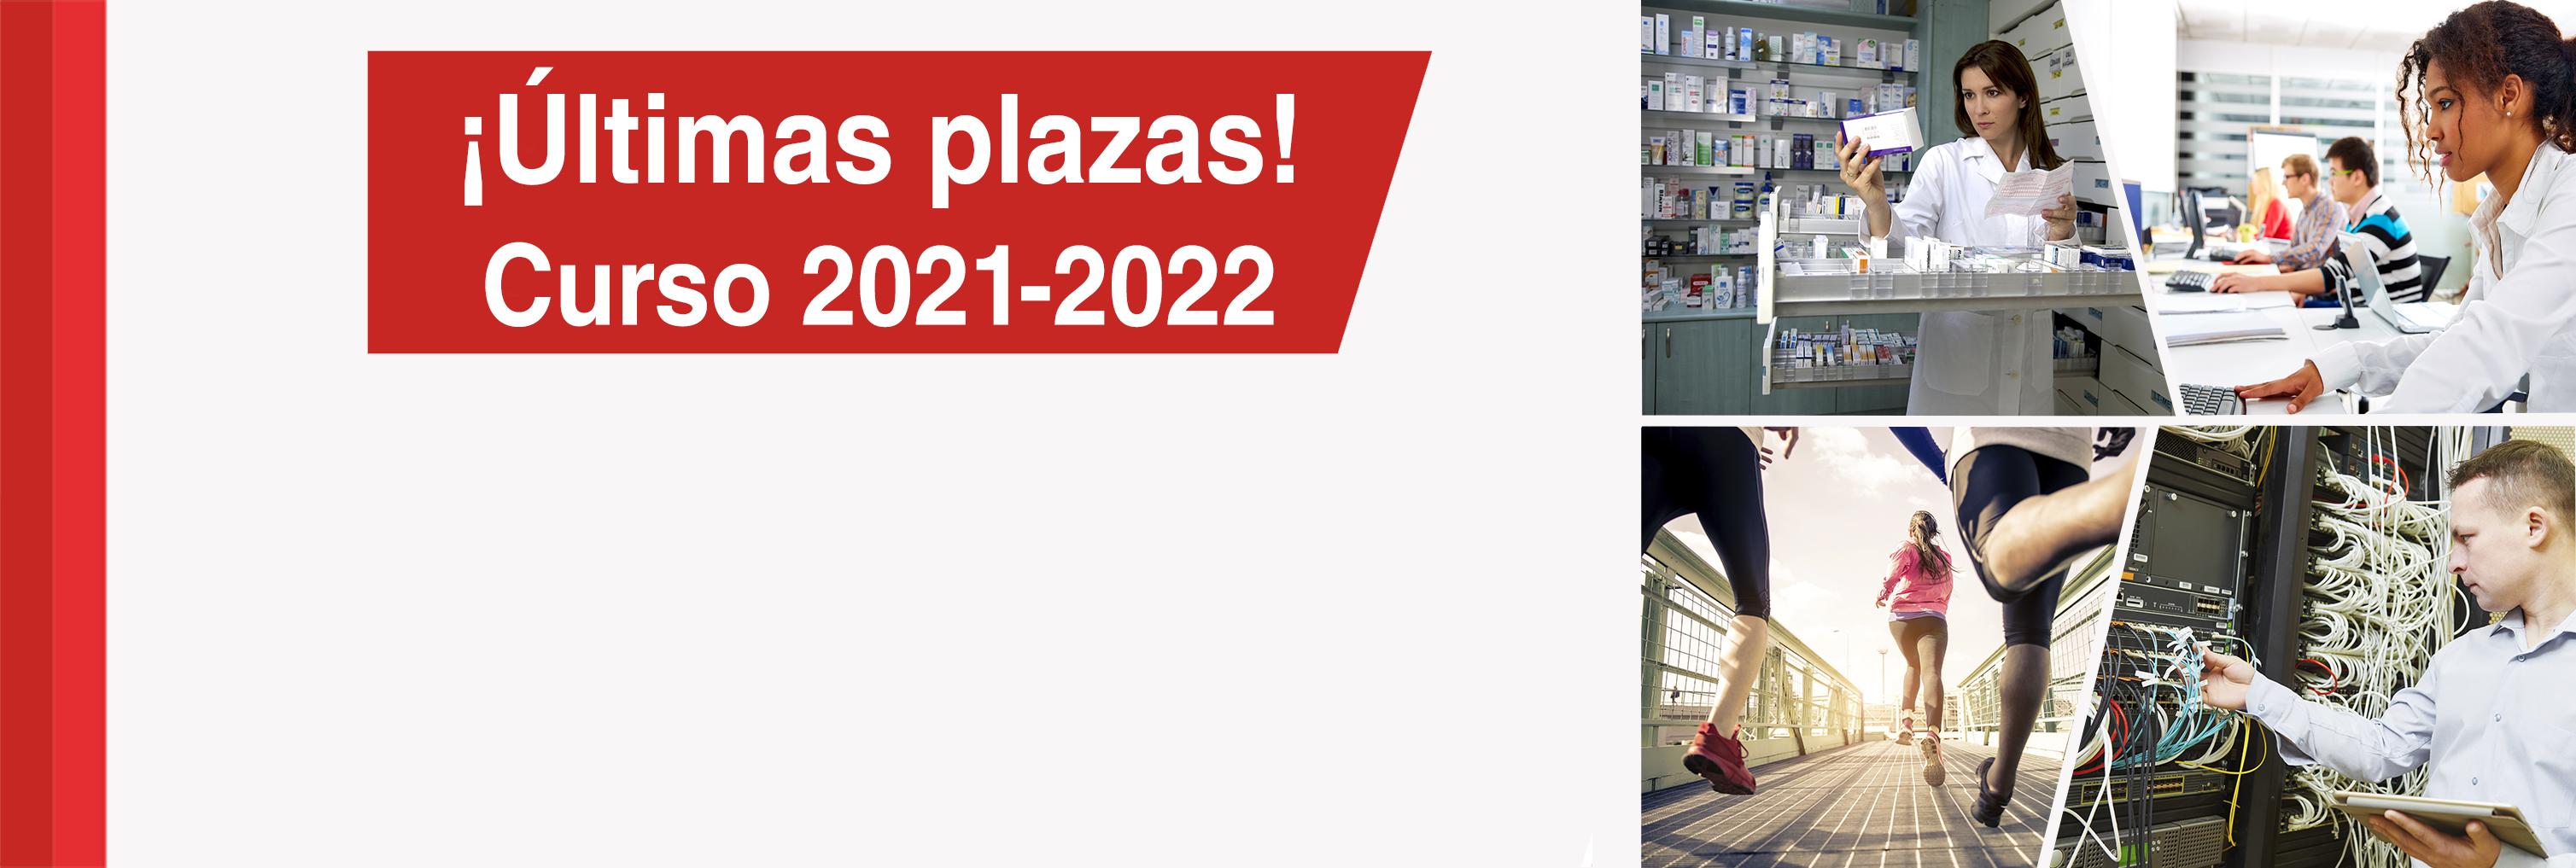 slide-ultimas-plazas-2021